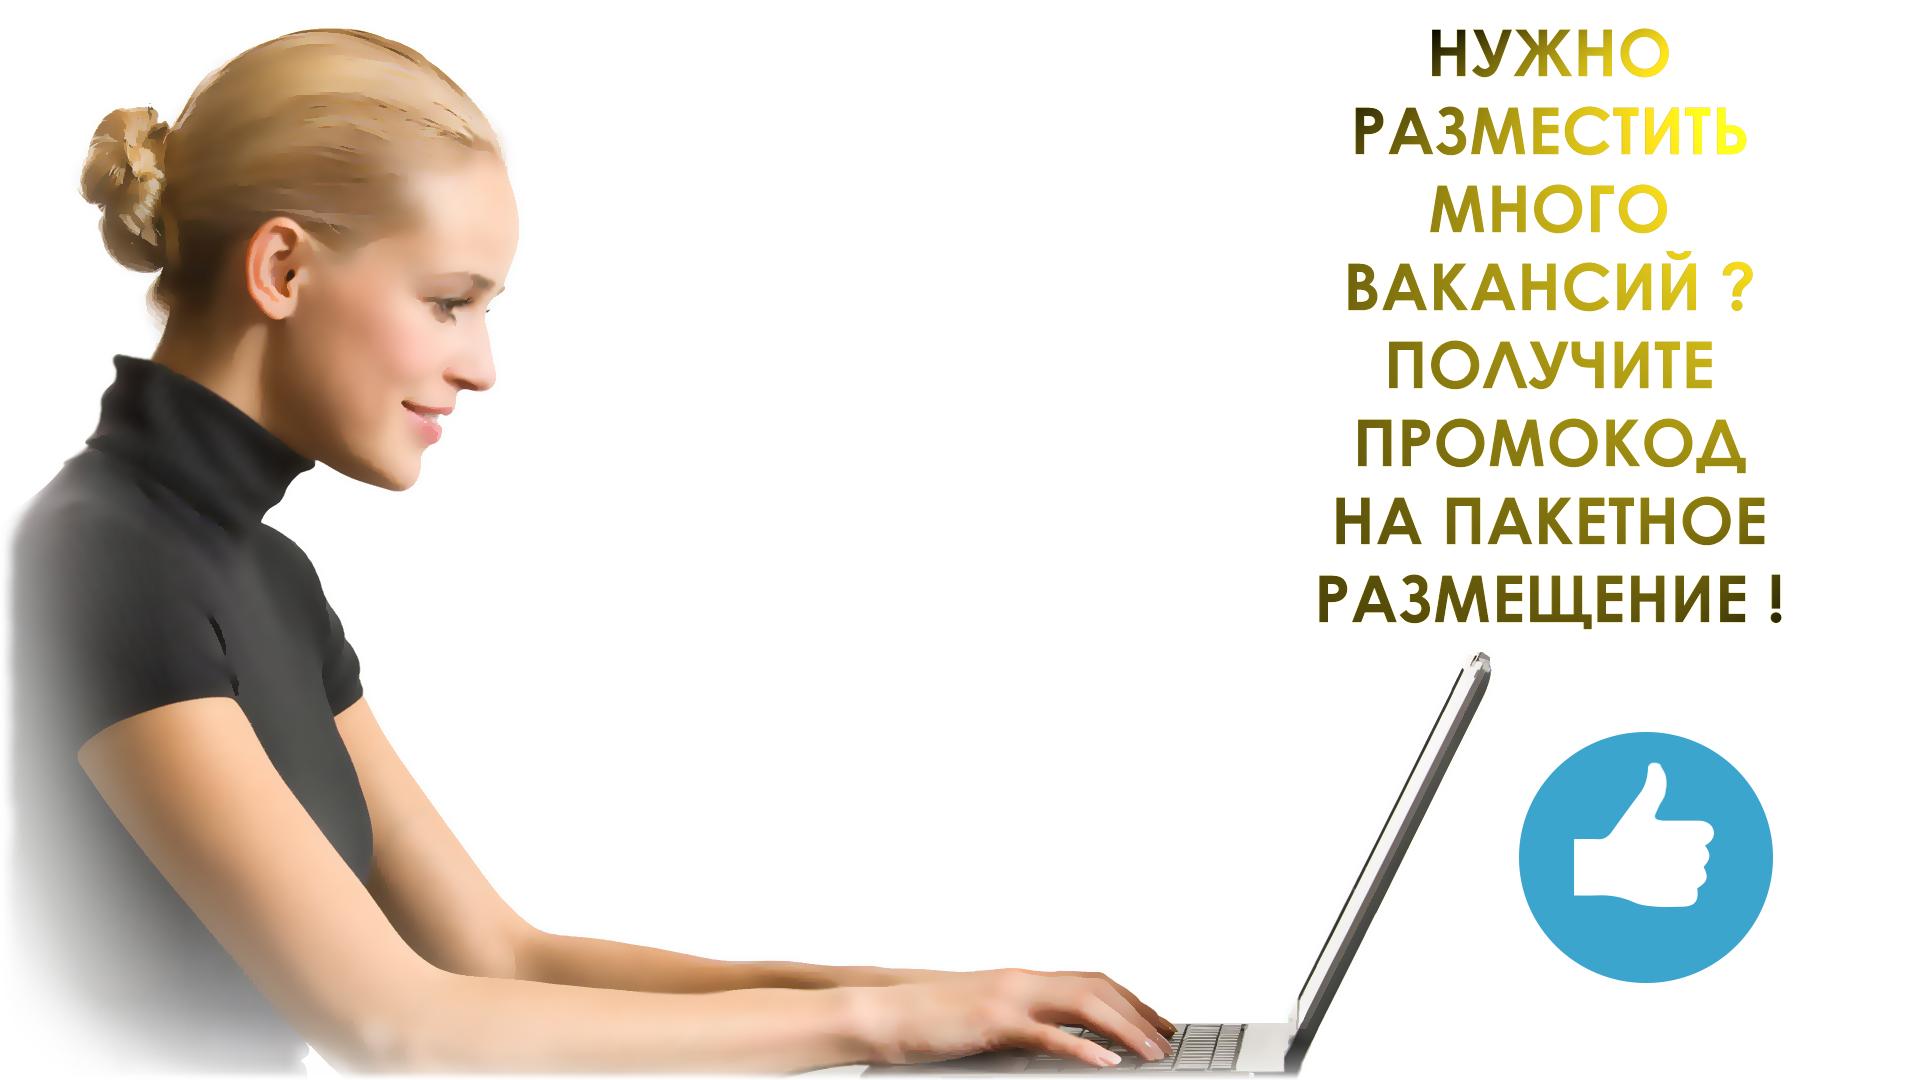 Работа в России  Работа вакансии база резюме поиск